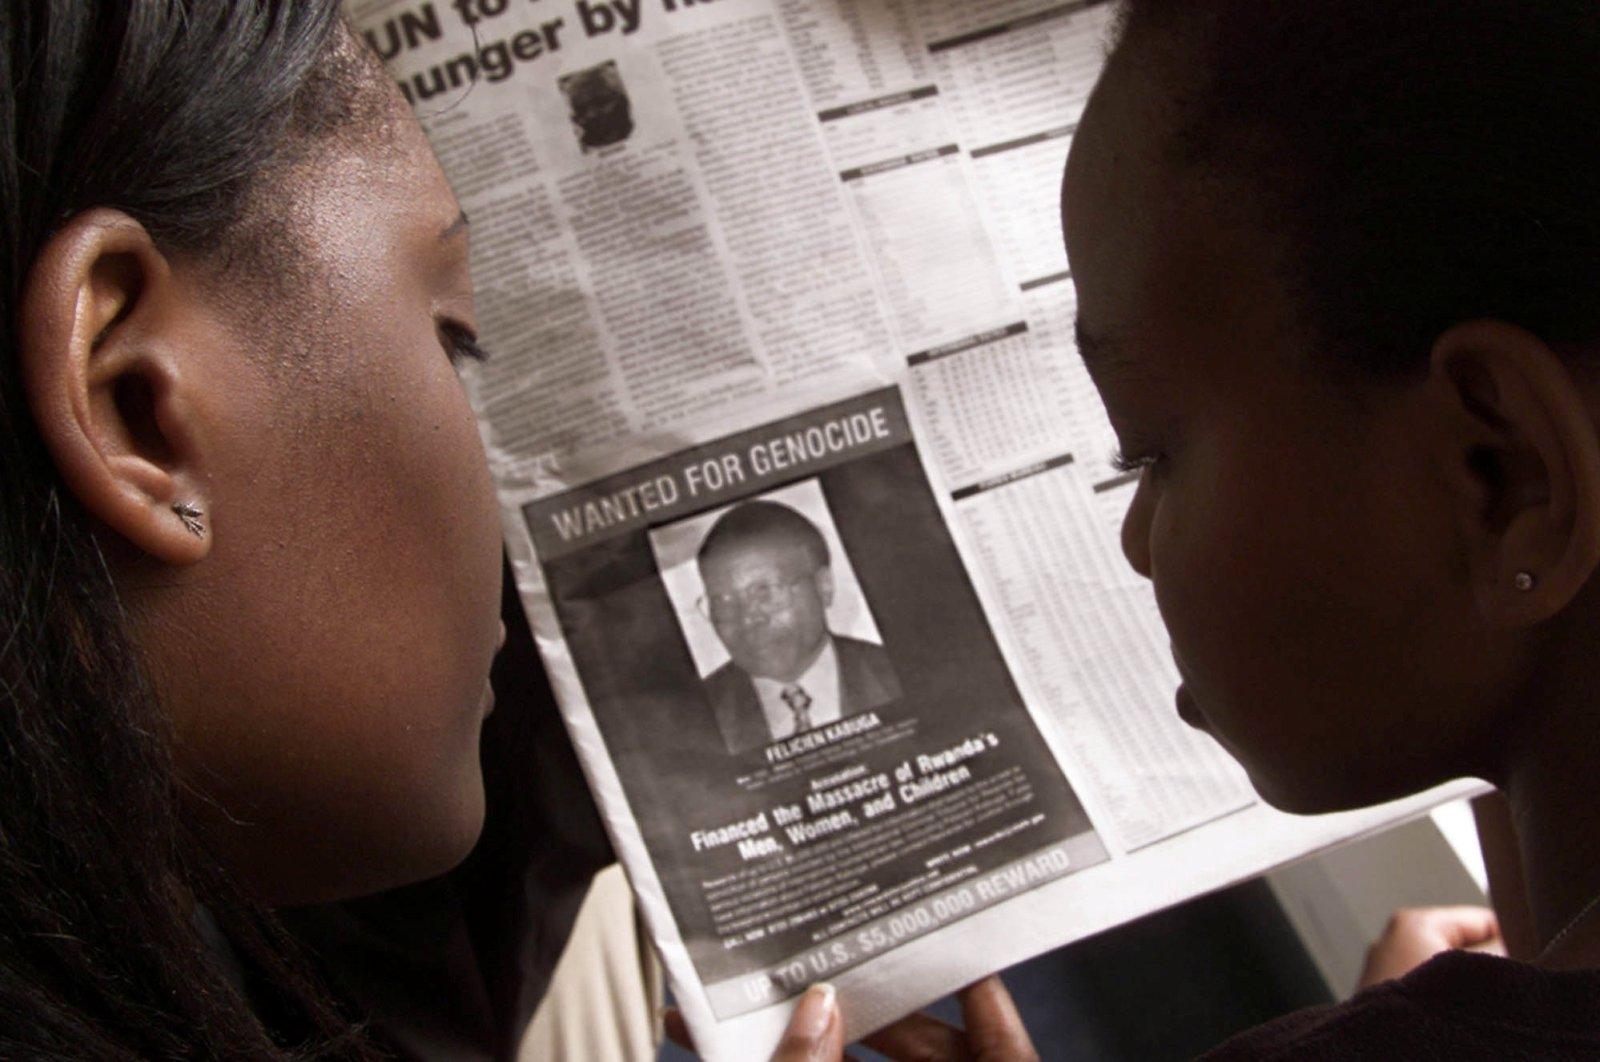 Readers look at a newspaper carrying the photograph of Rwandan Felicien Kabuga wanted by the United States in Nairobi, Kenya, June 12, 2002. (REUTERS Photo)